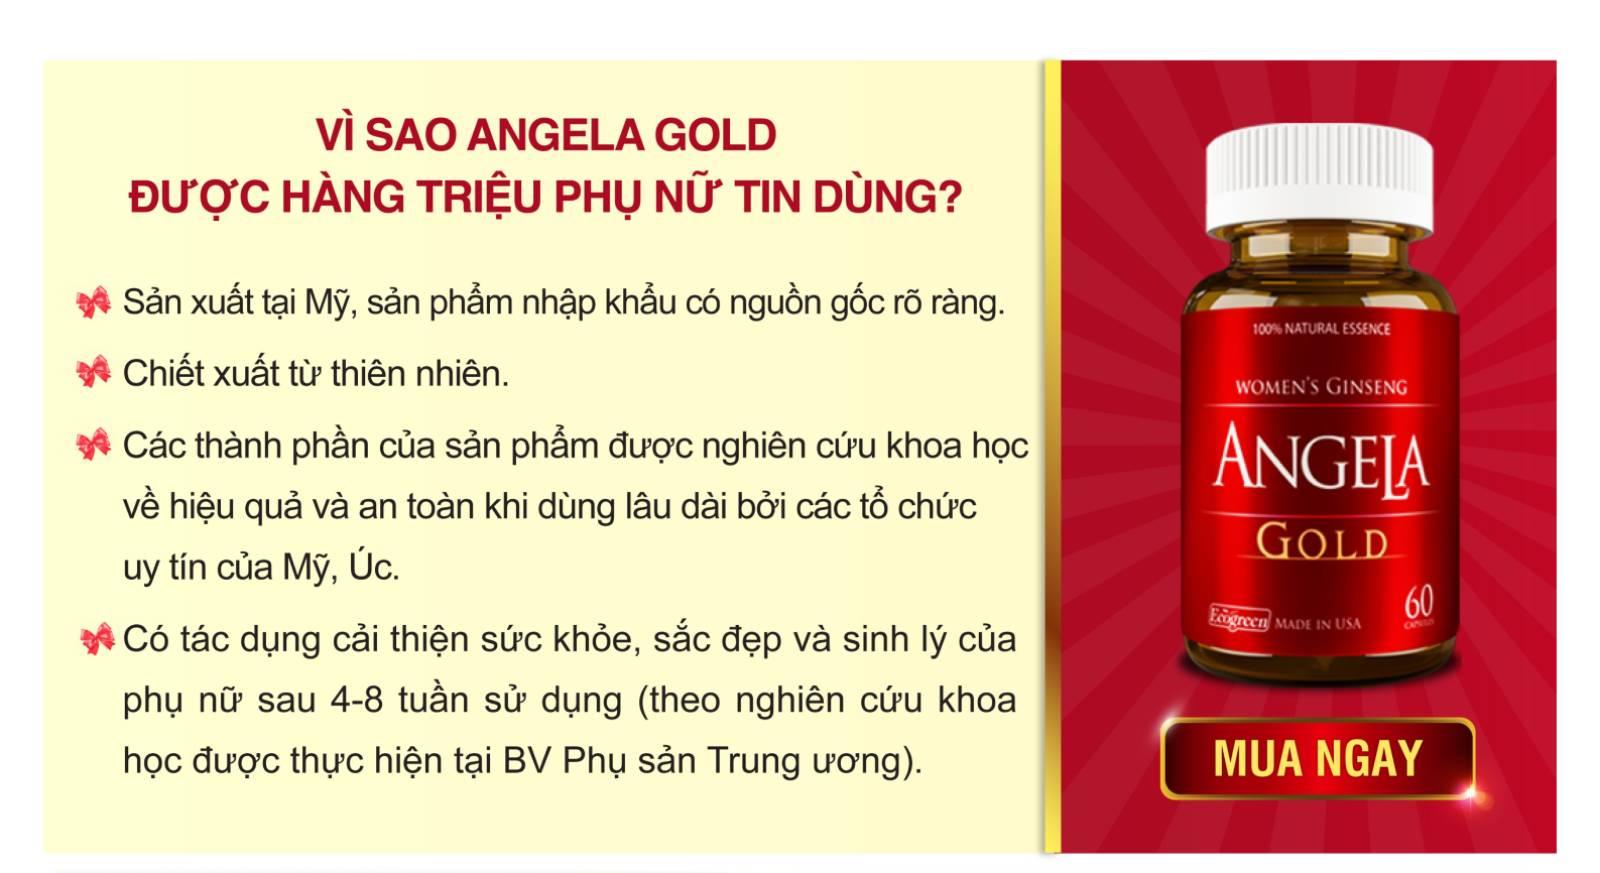 Lý do chọn Angela Gold